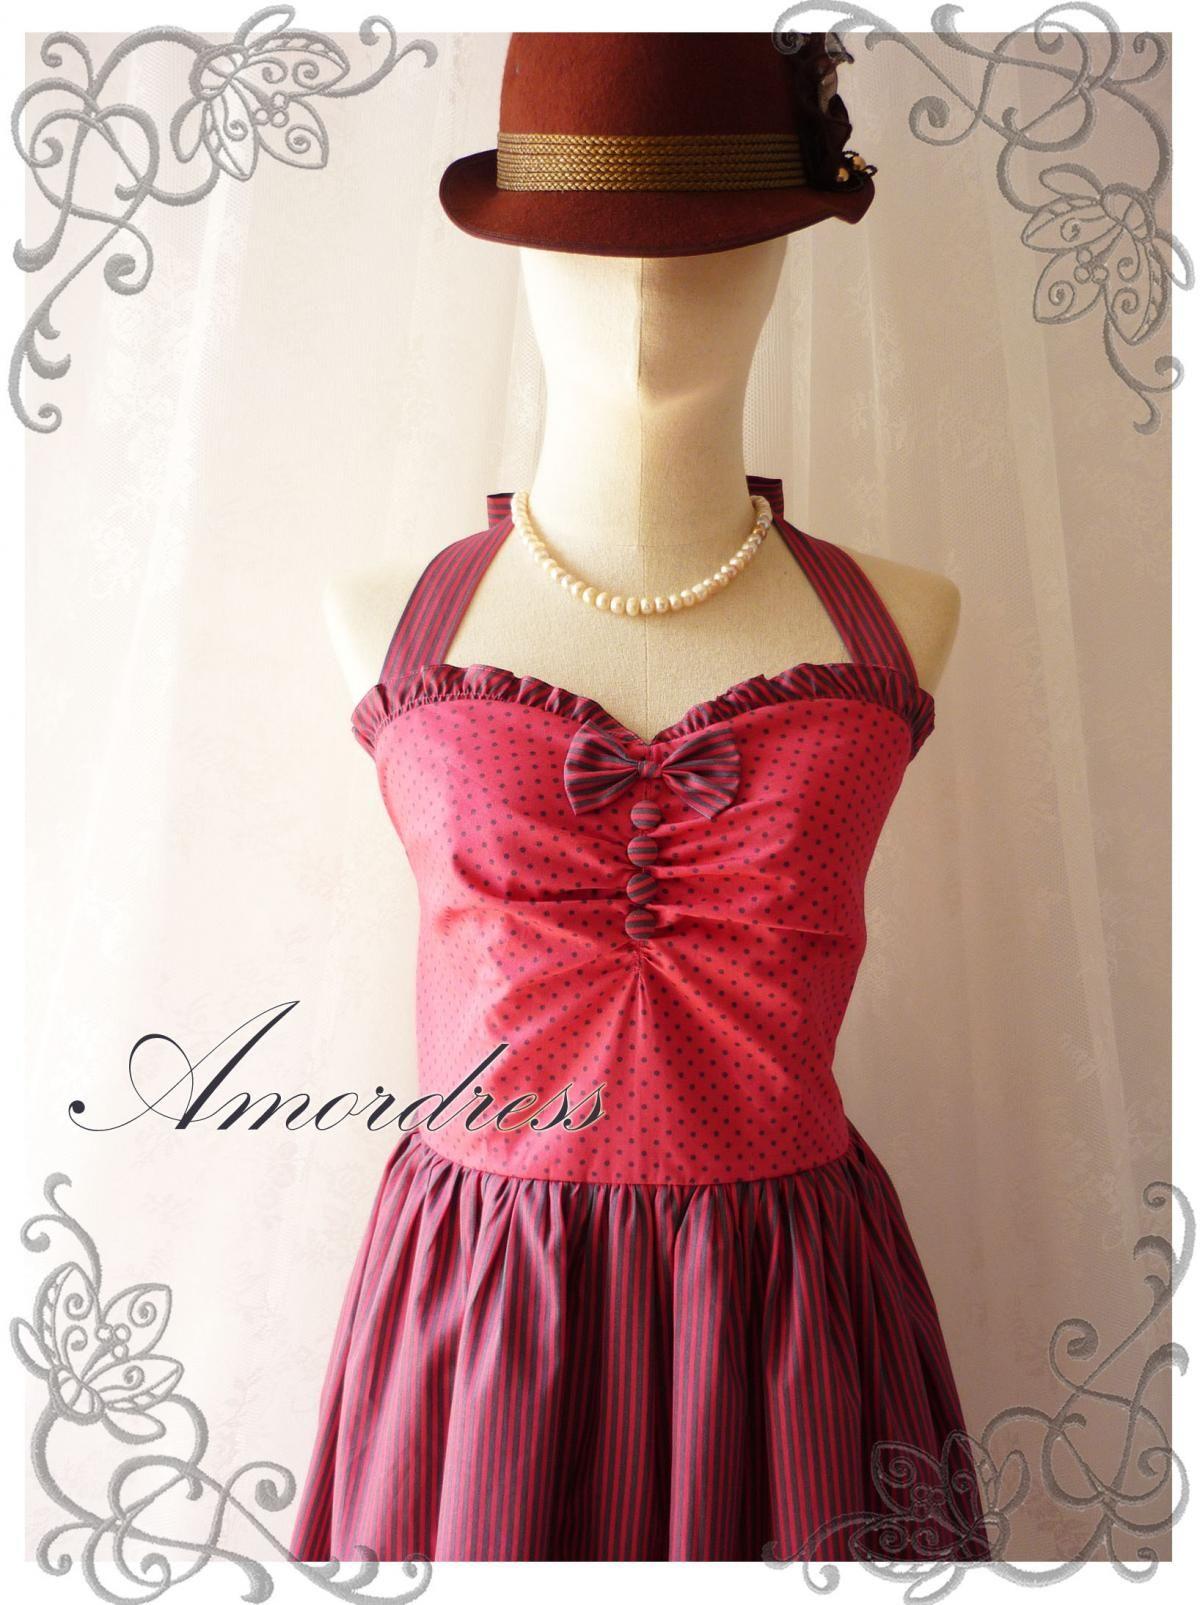 Crimson red summer dress